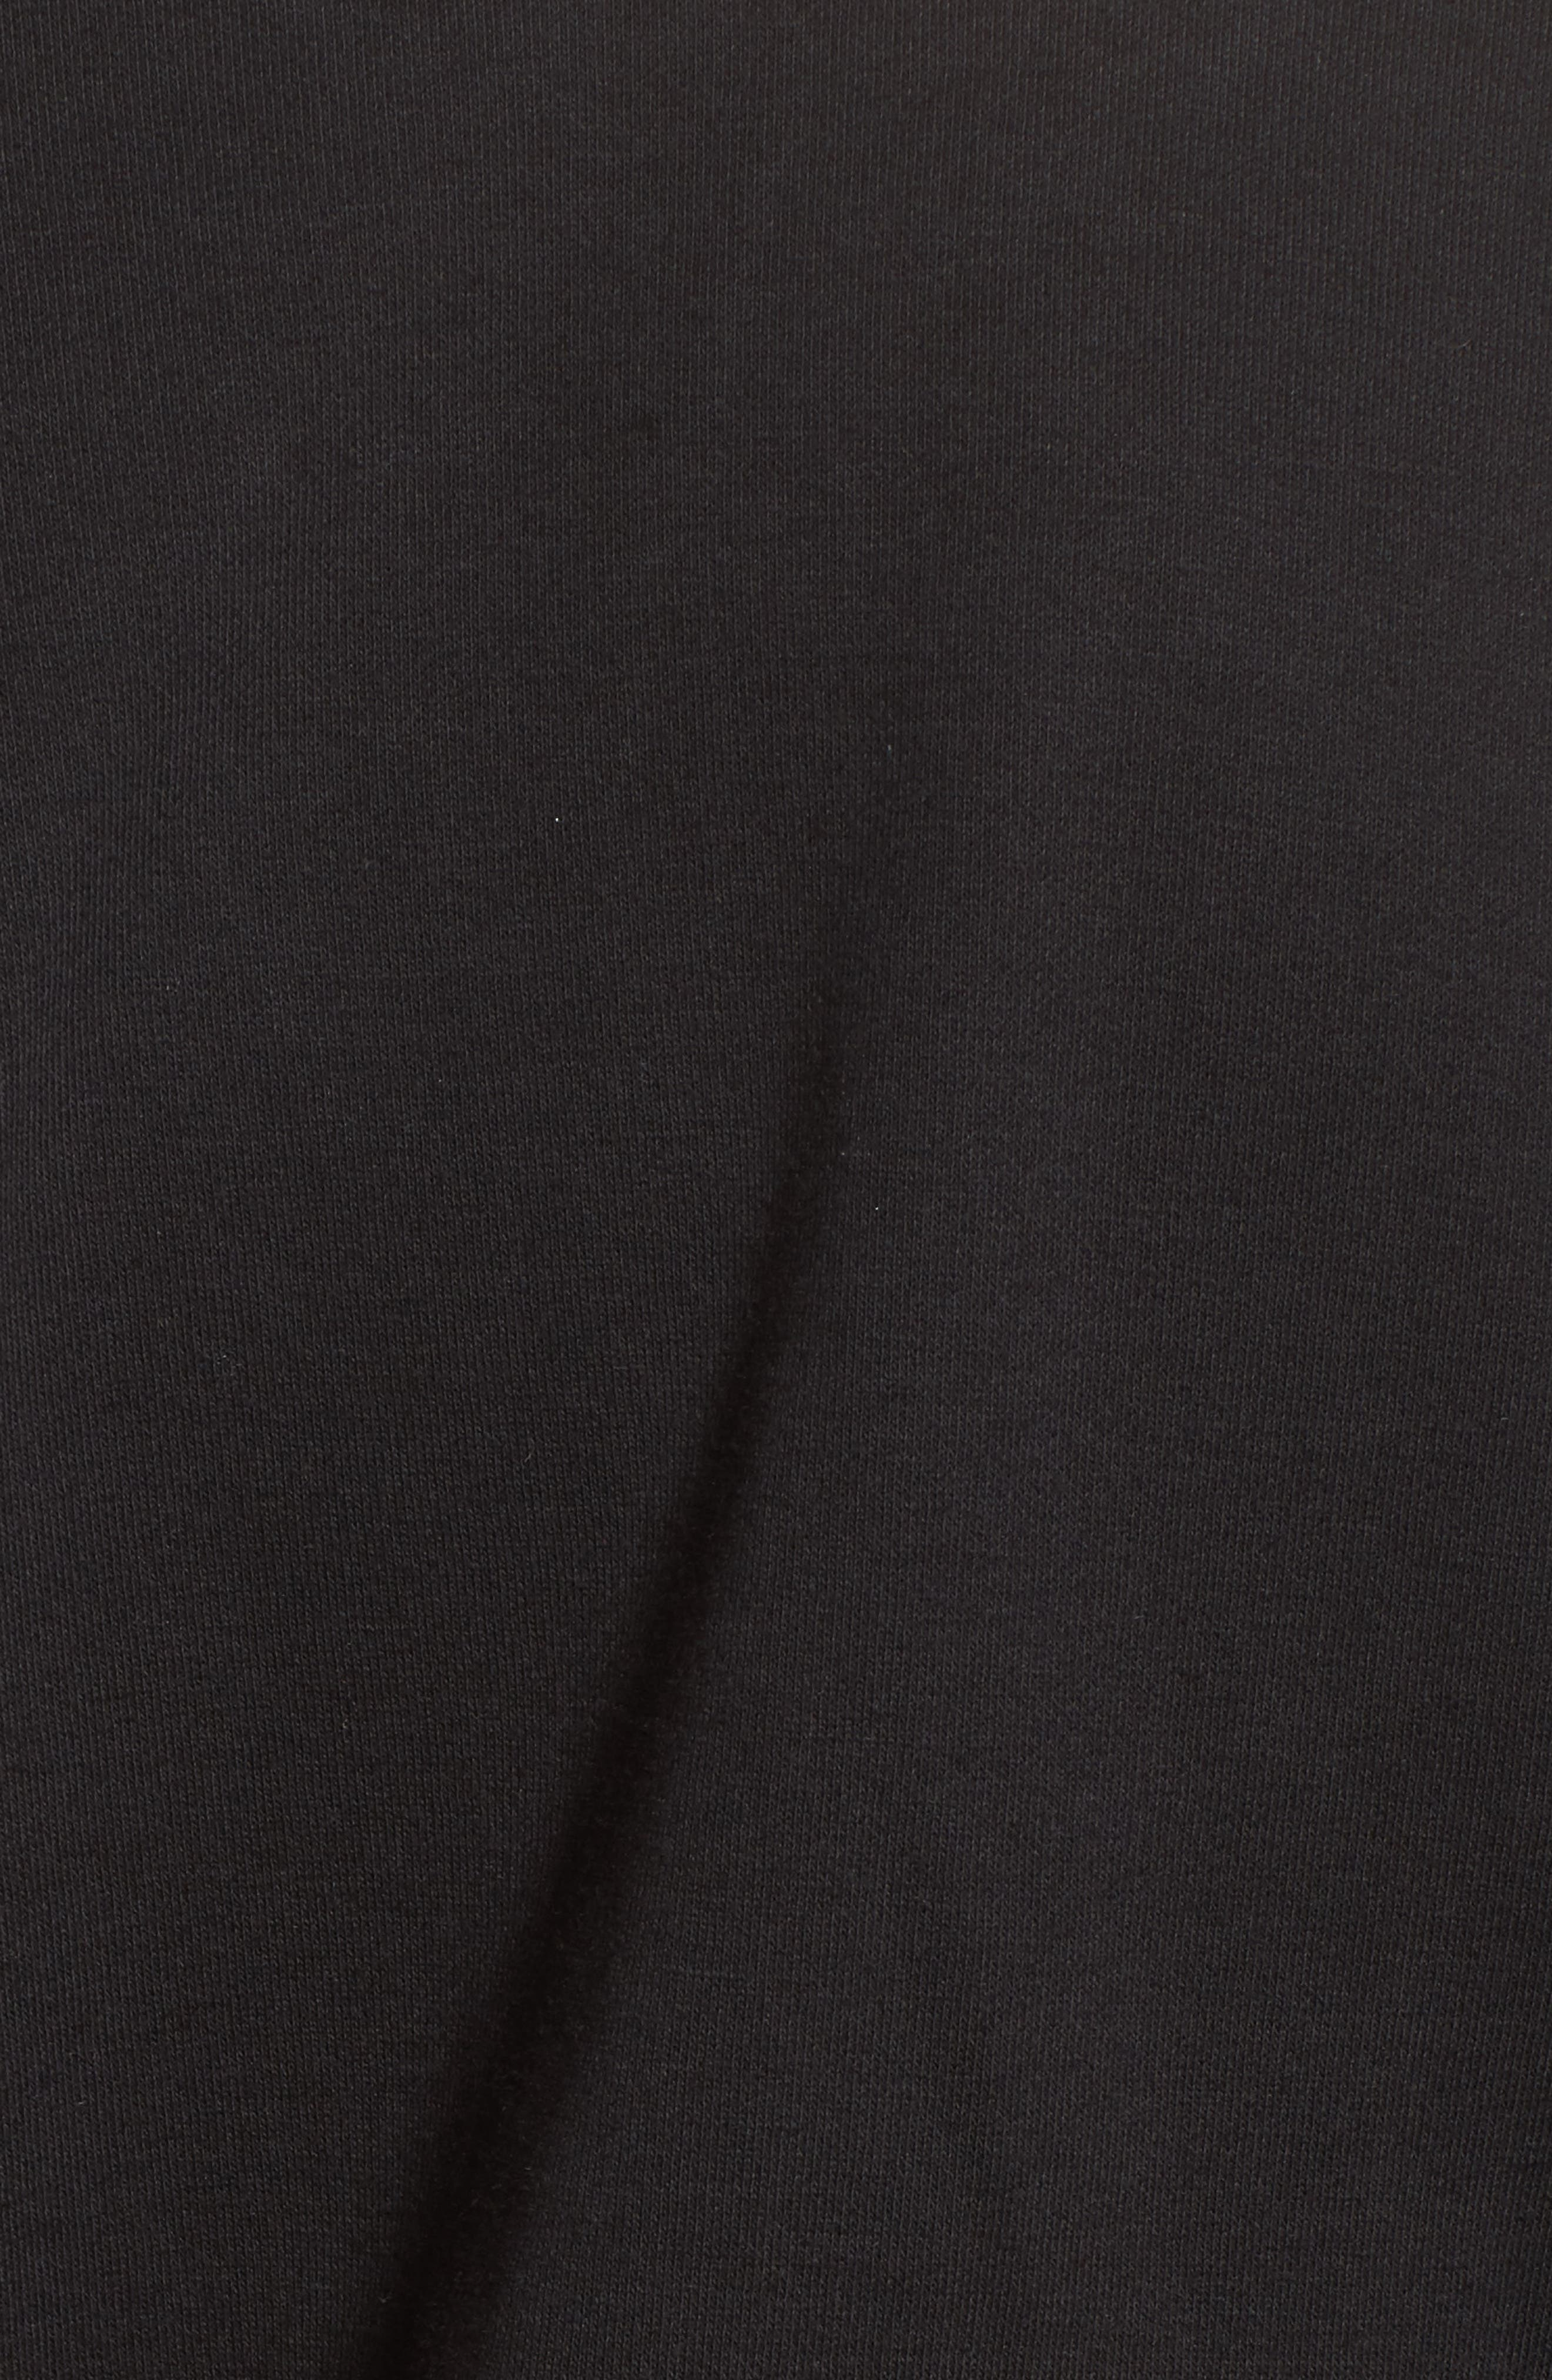 Blouson Sleeve Sweatshirt,                             Alternate thumbnail 21, color,